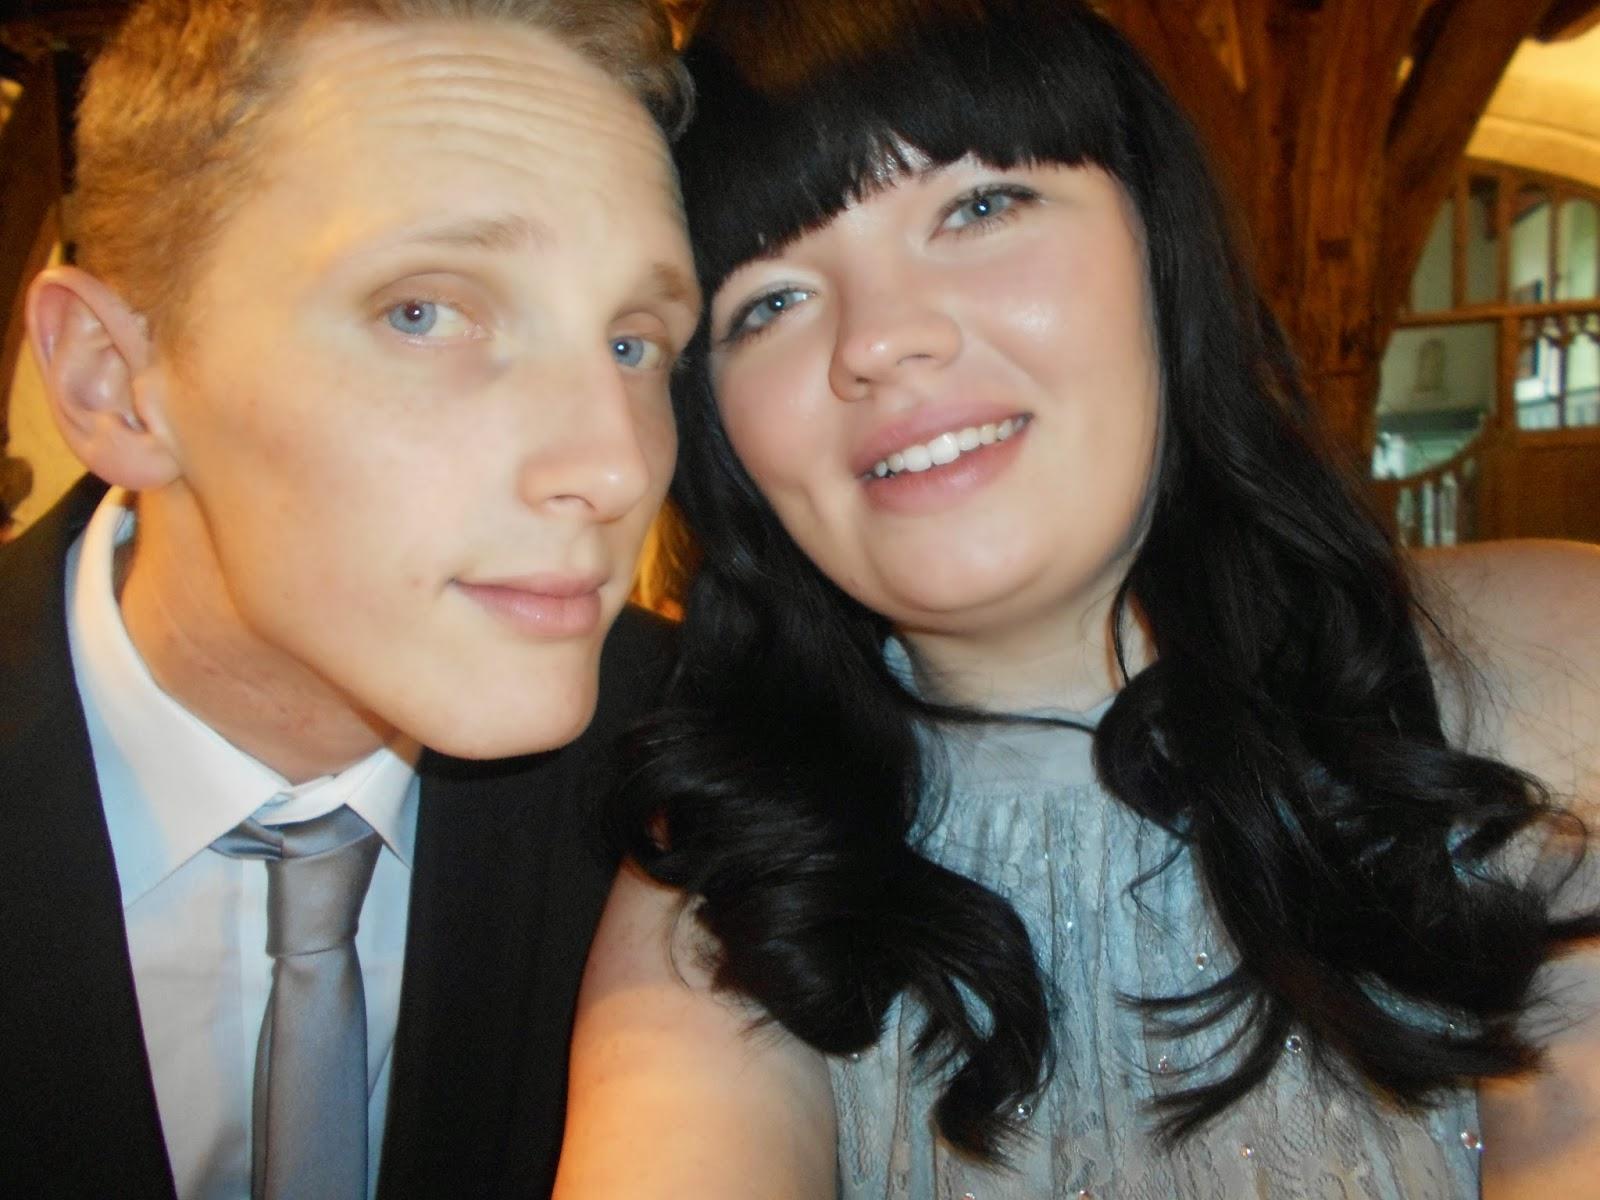 Myself and Gaz - Bridesmaid and Fiancé